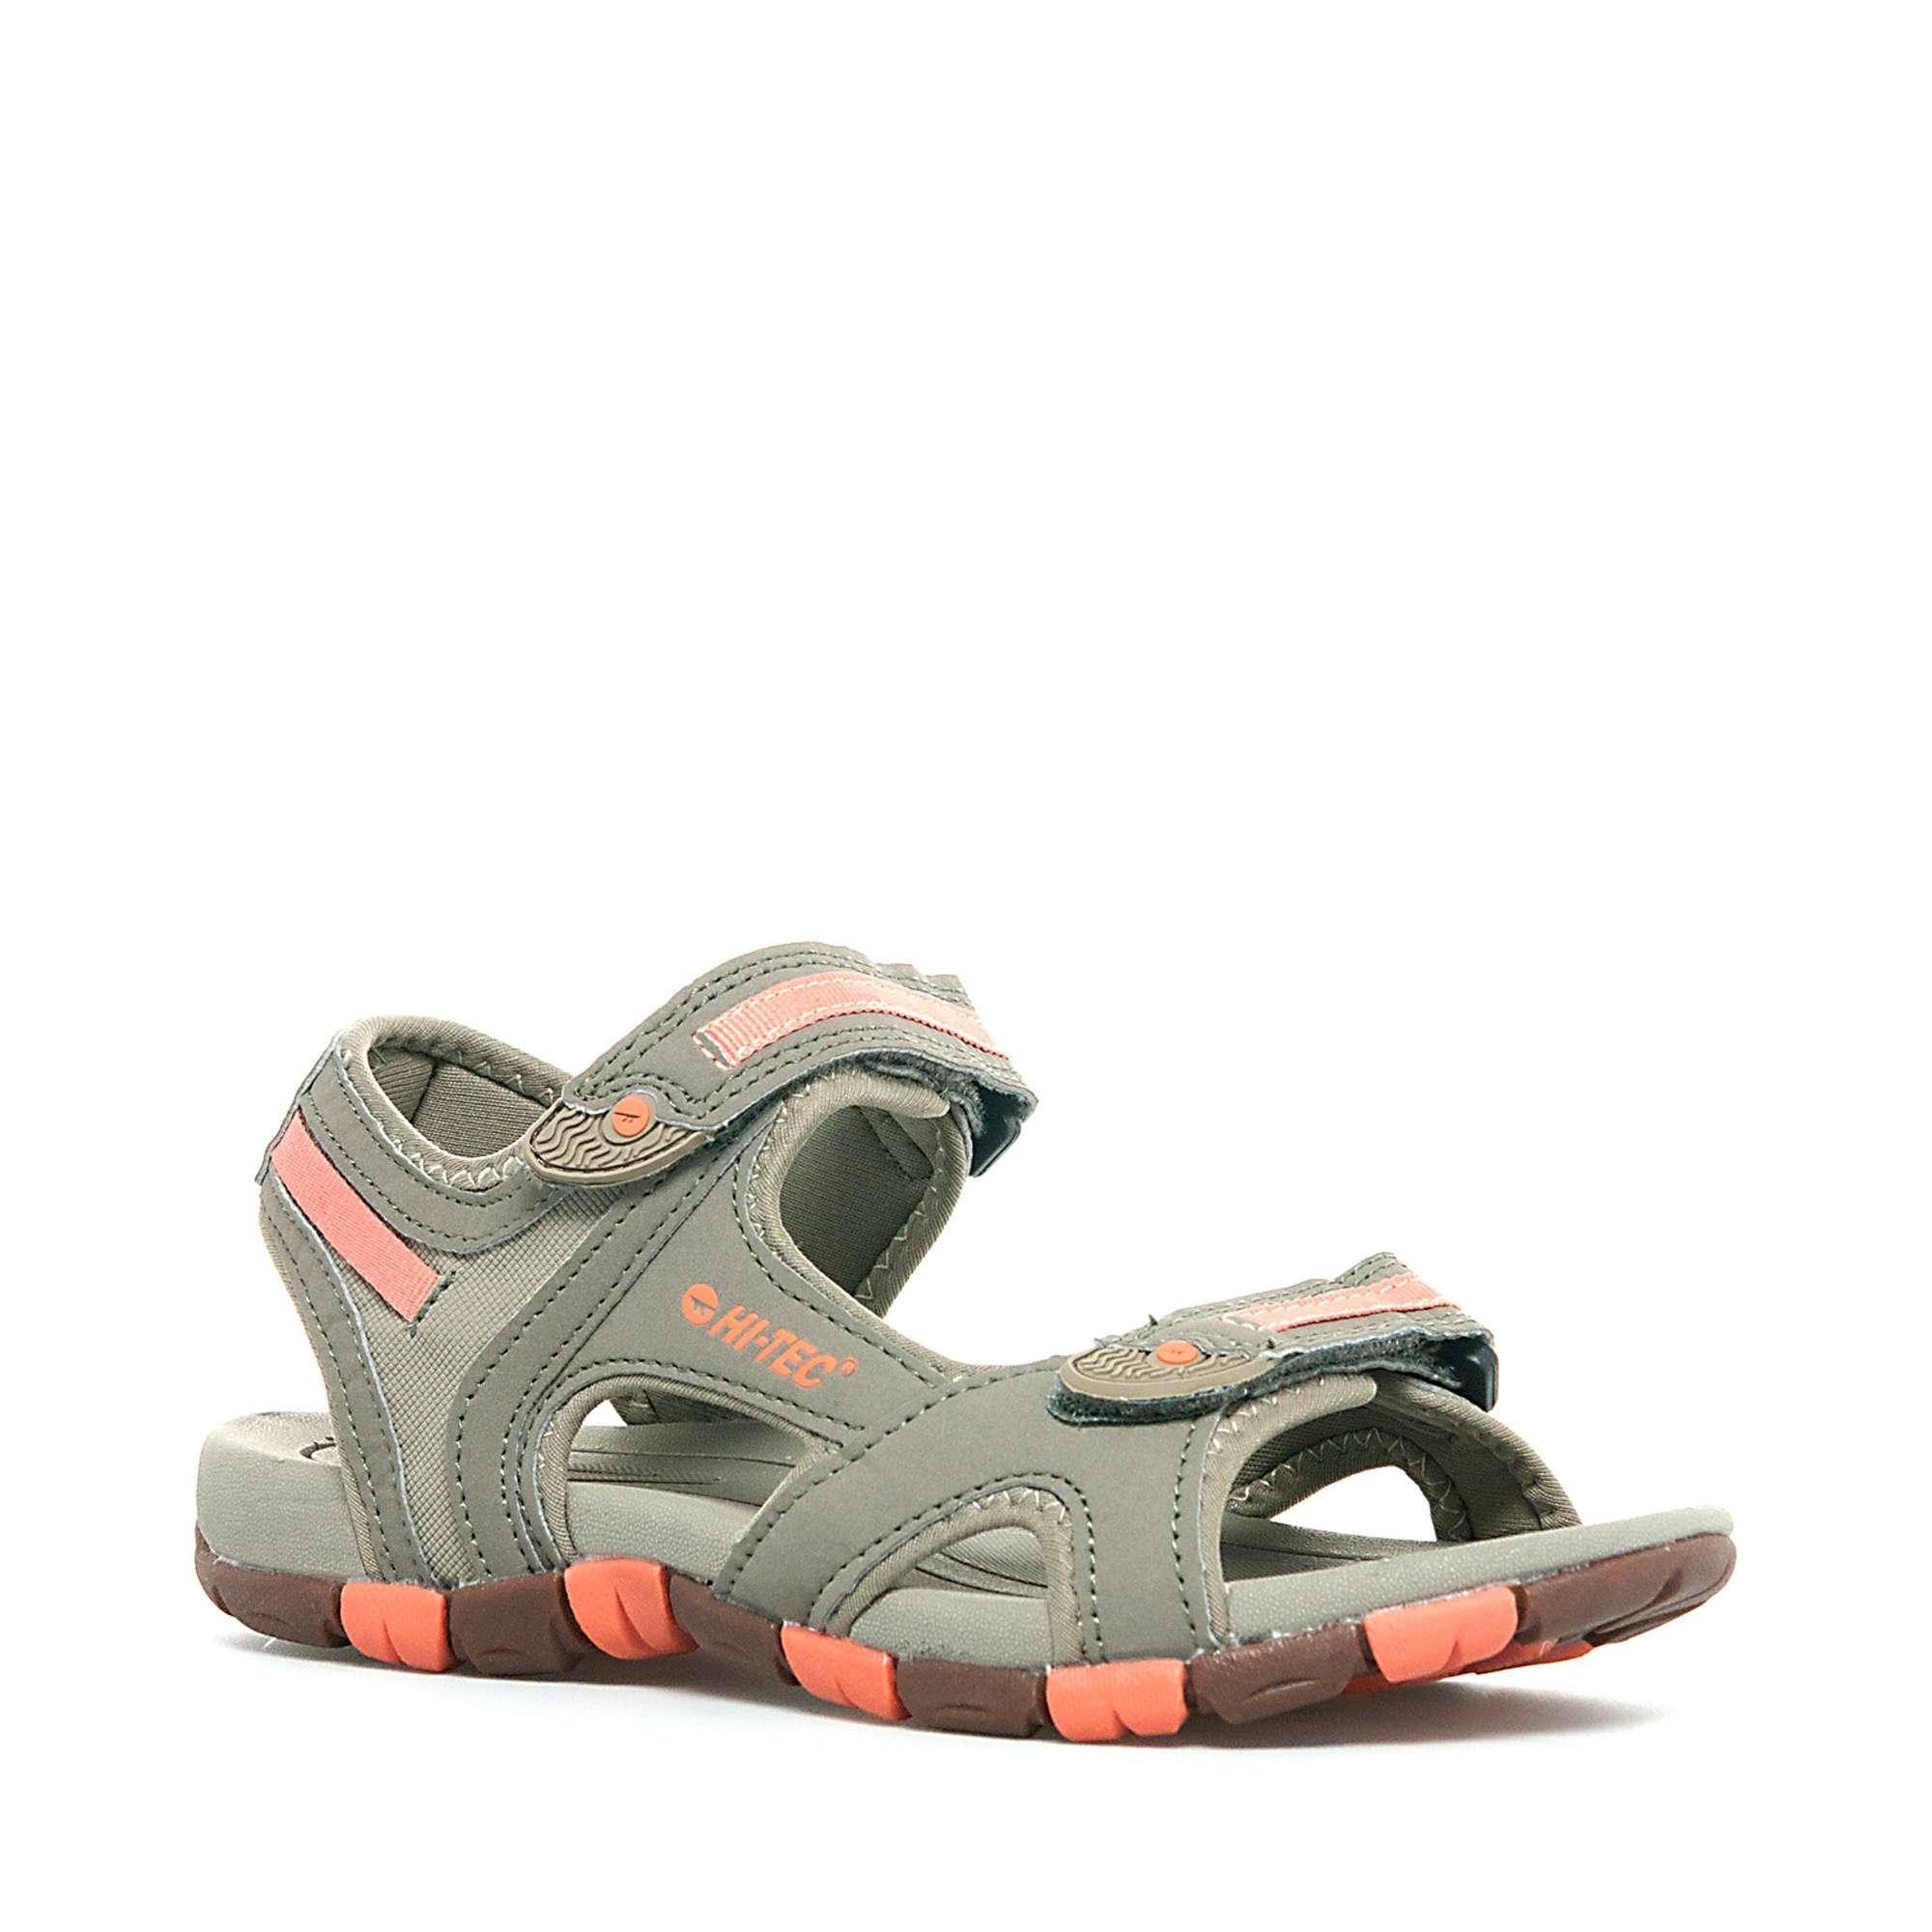 HI TEC Girls' GT Strap Sandal